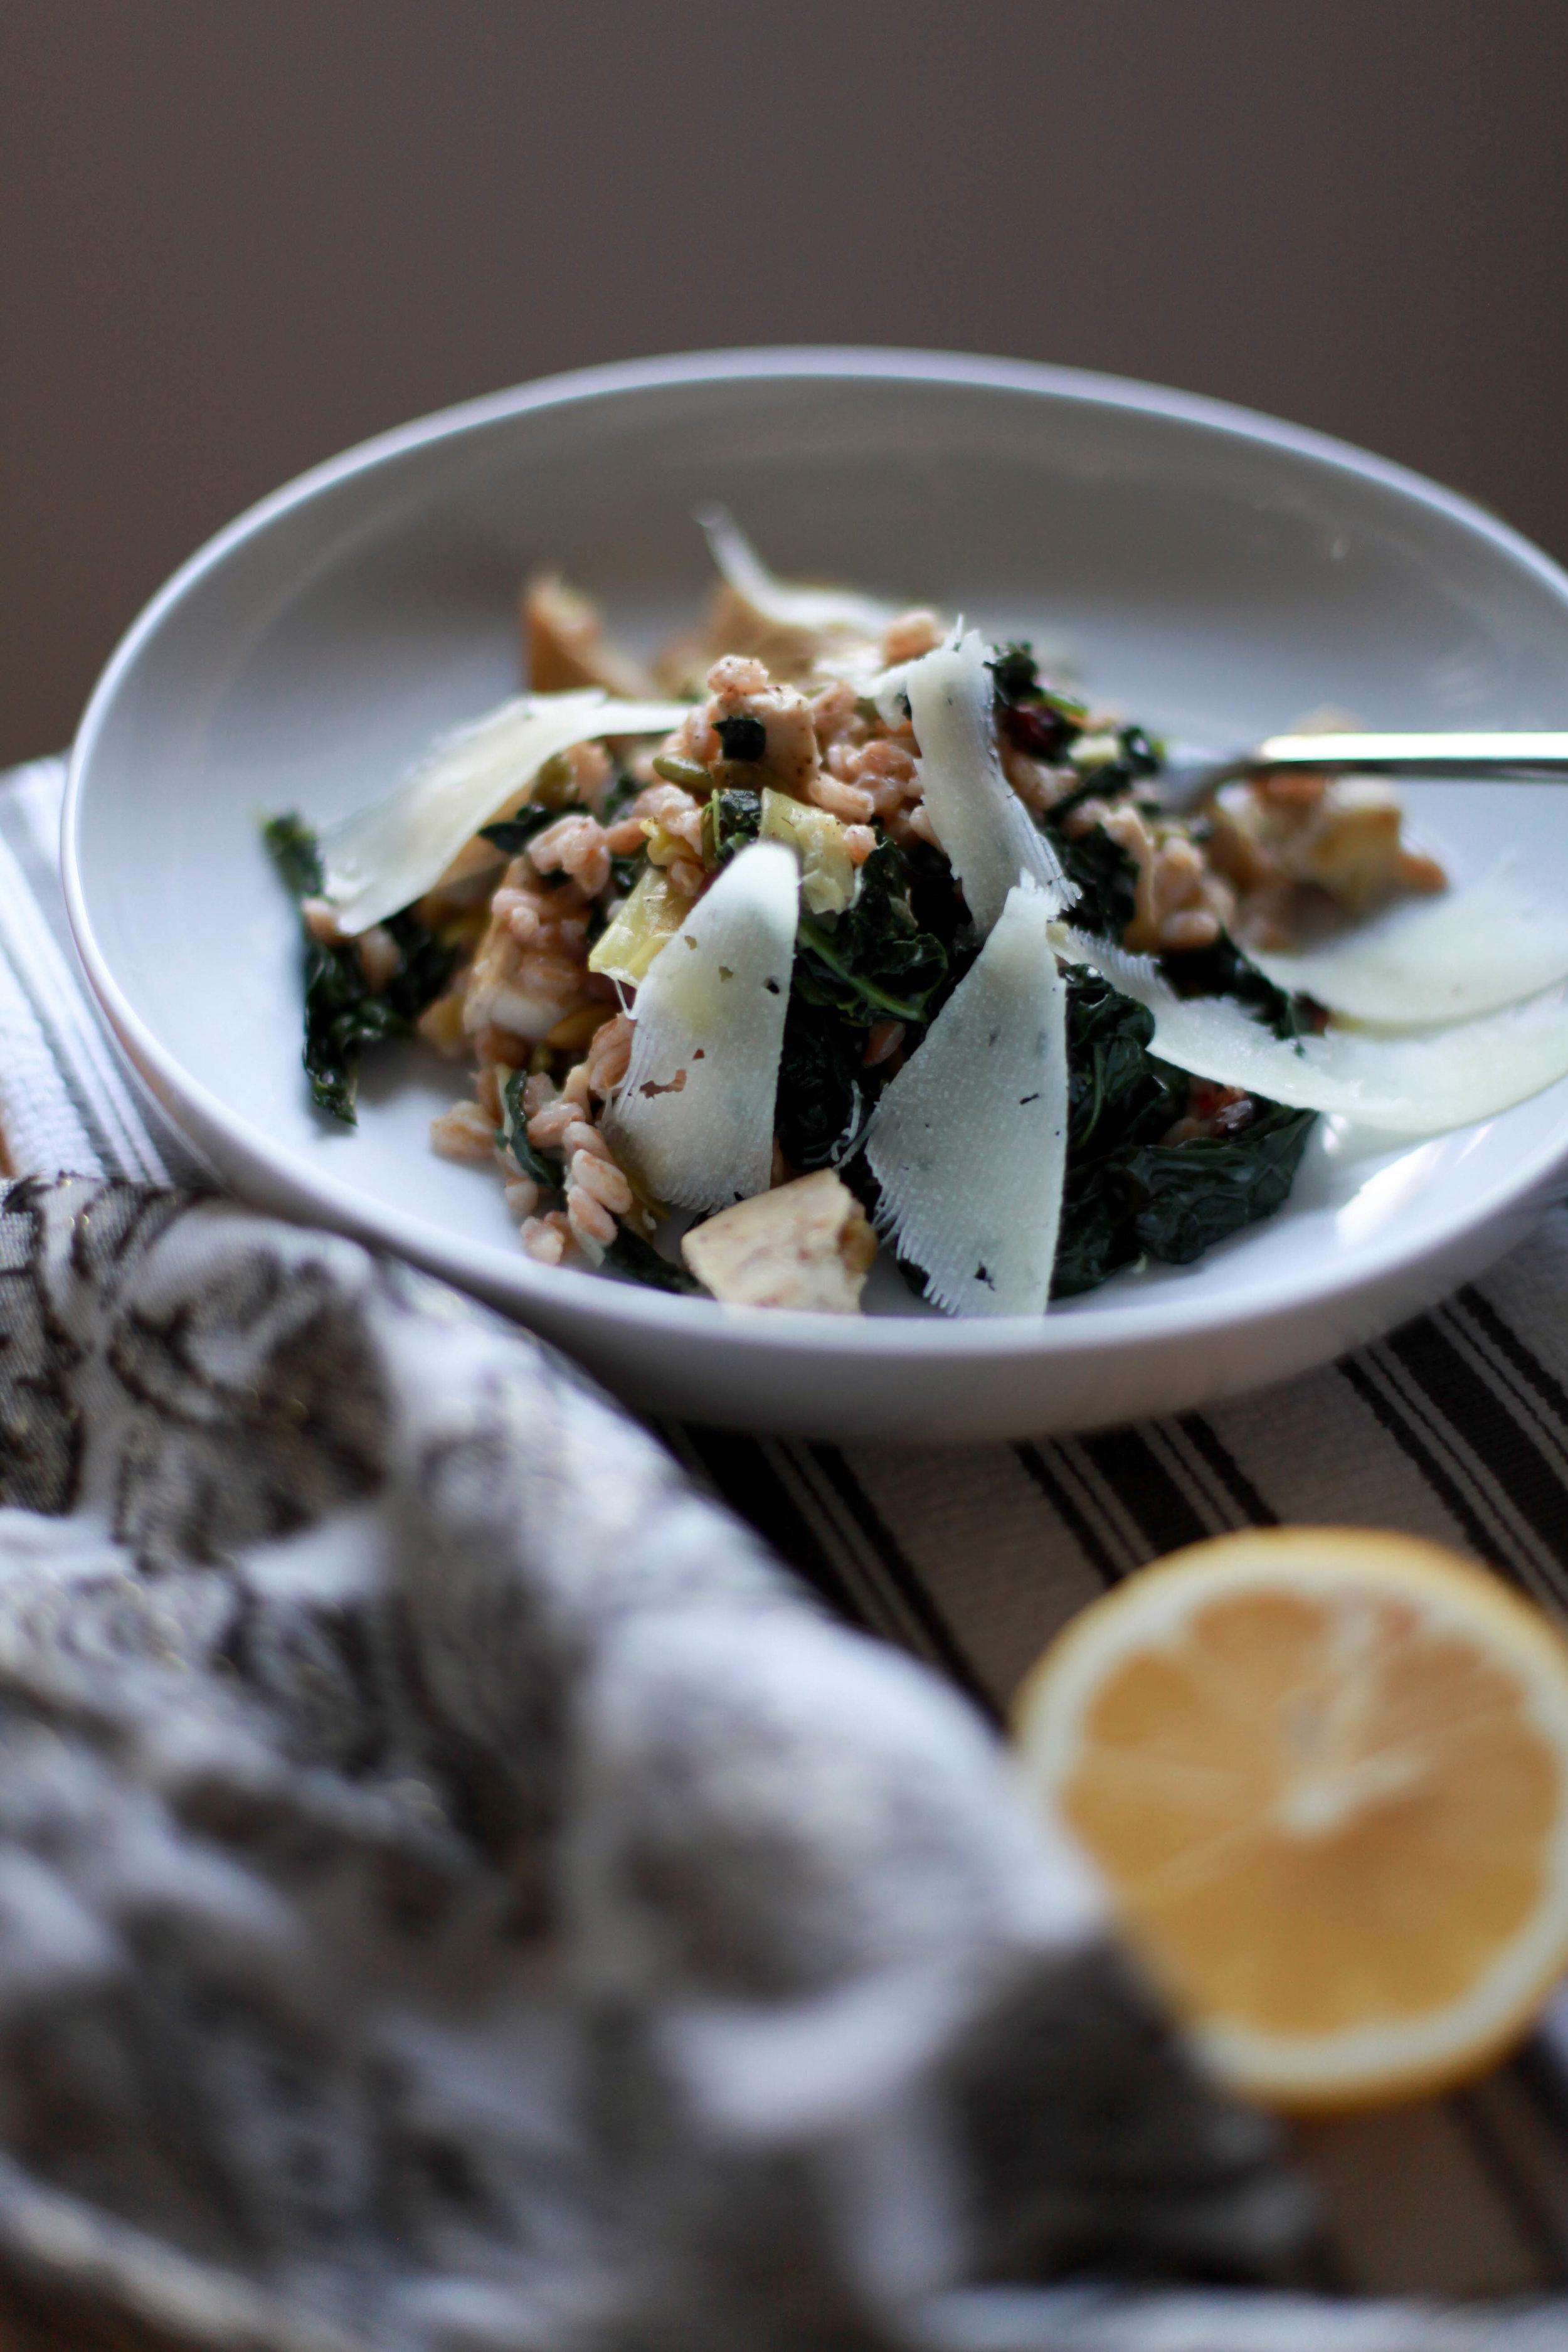 Grain and Kale Salad - serves 6